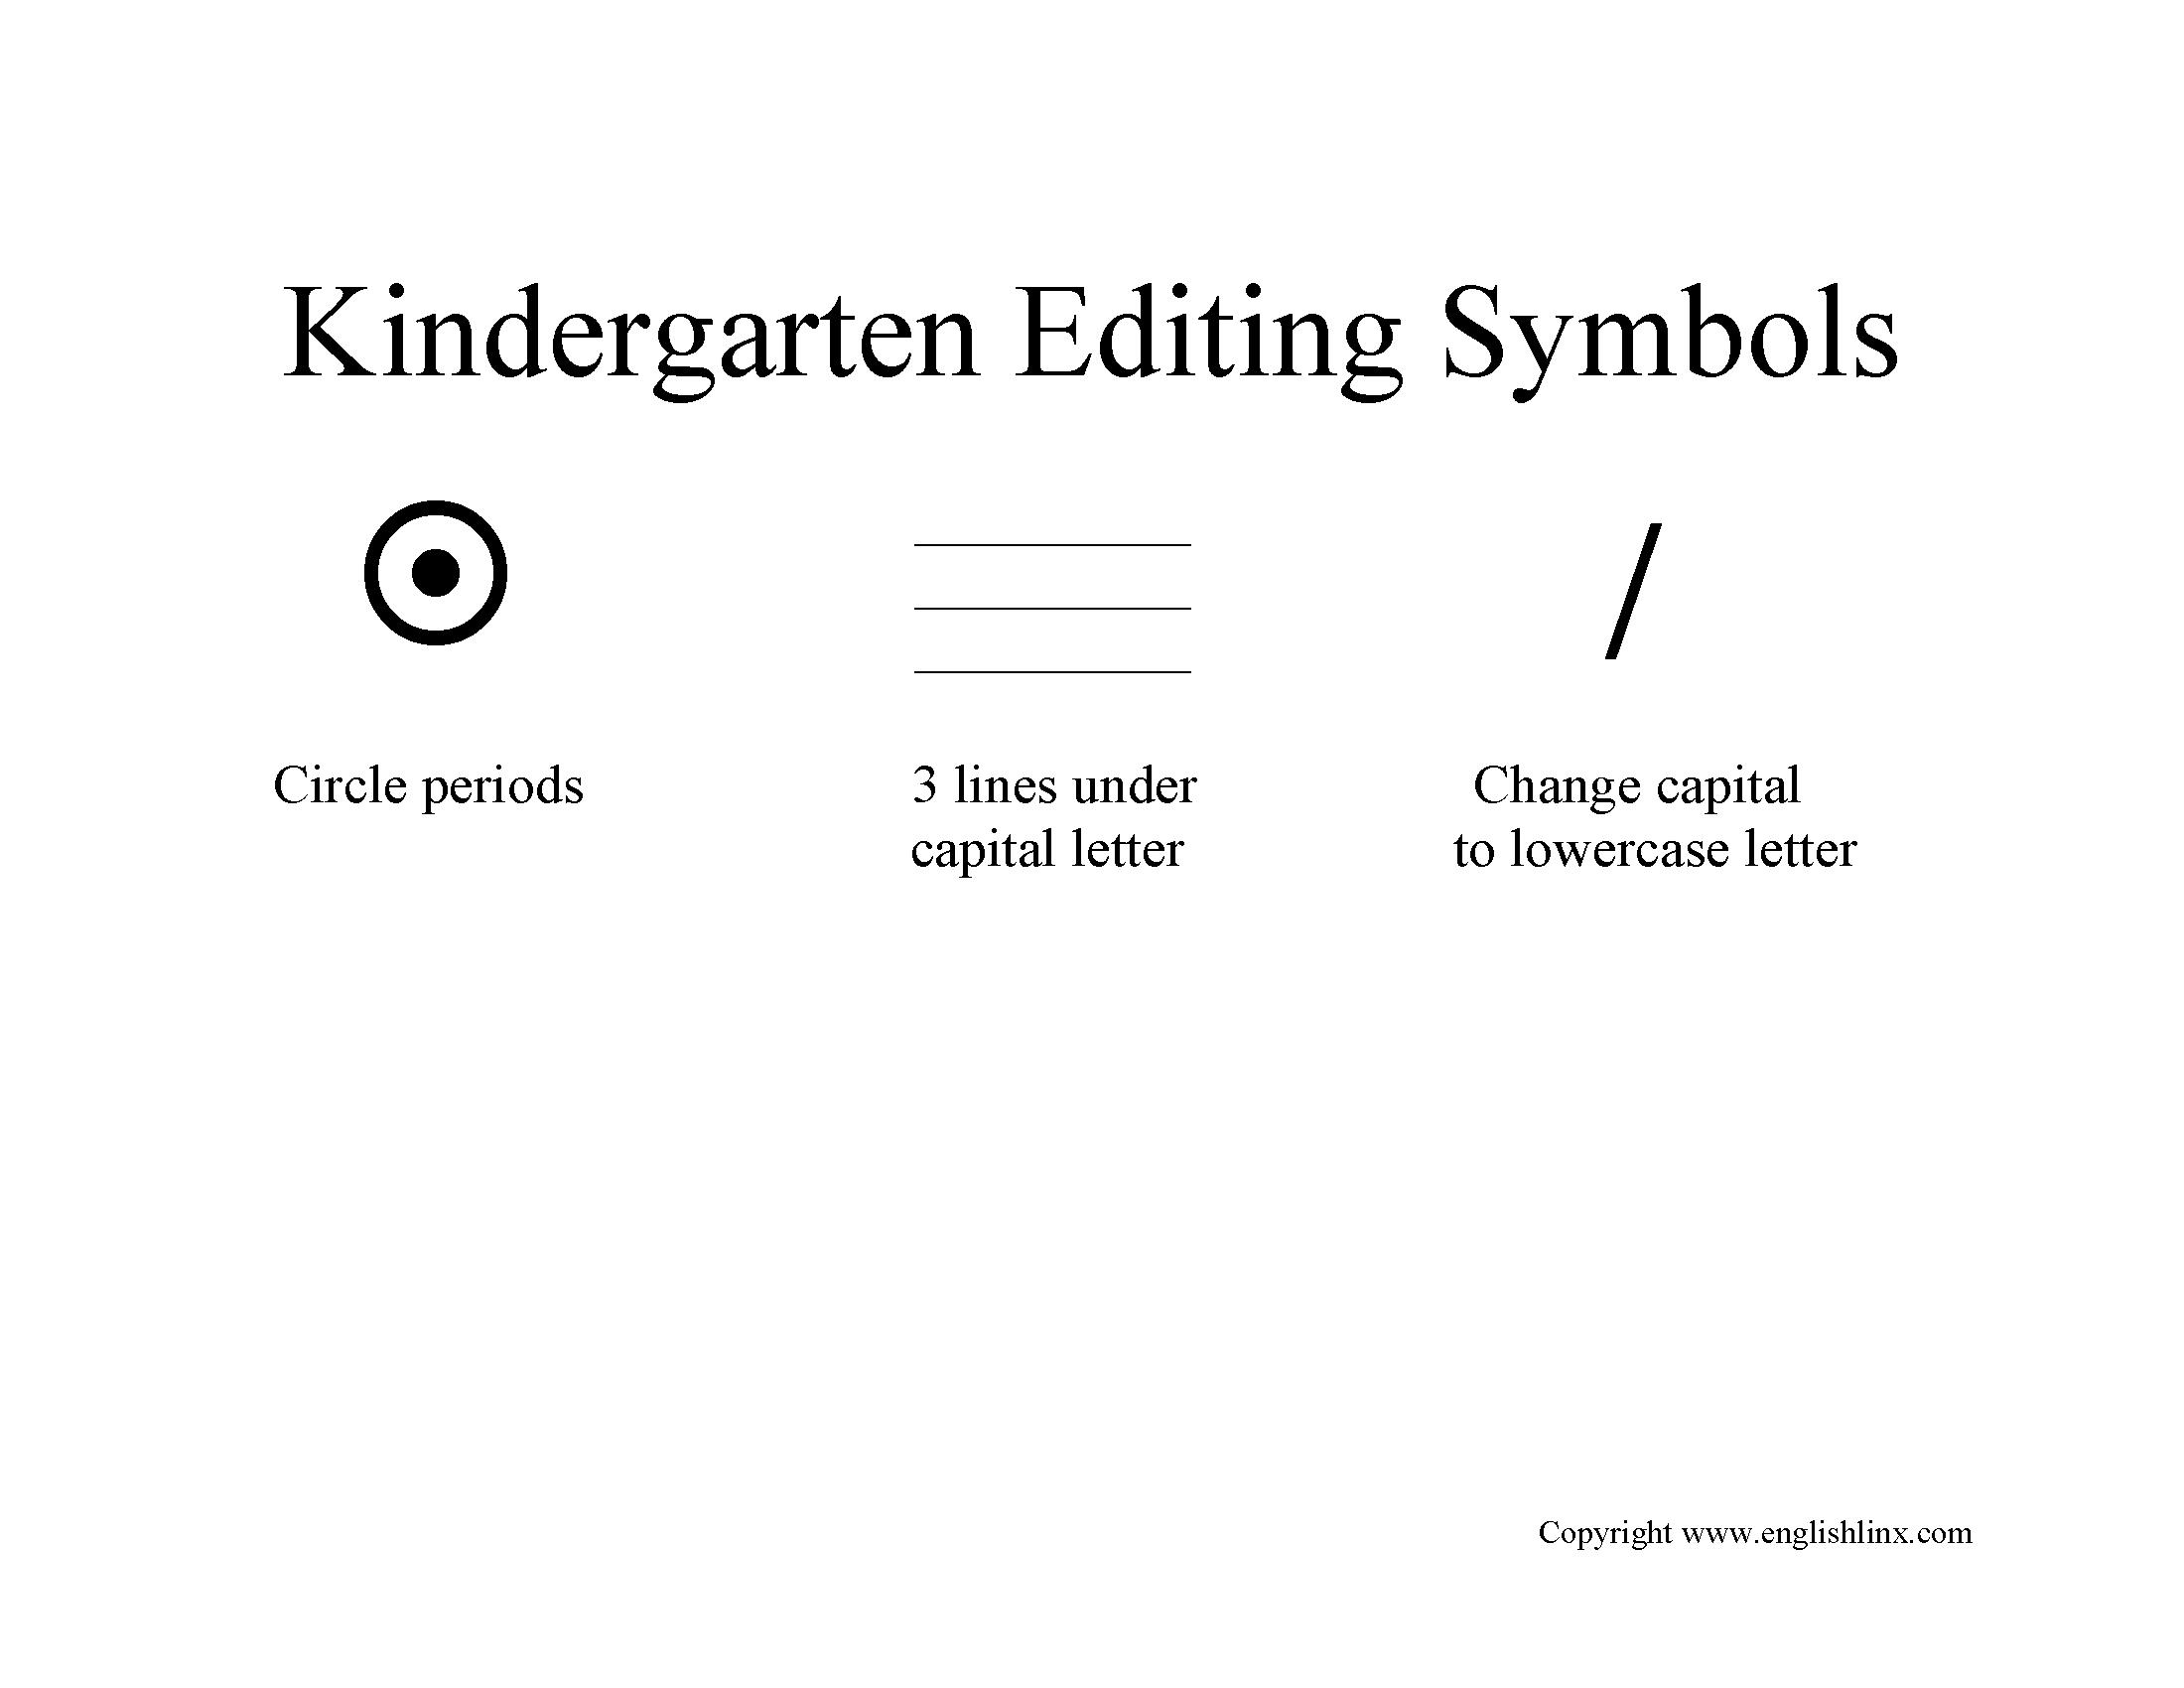 K 5 Editing Symbols Worksheet